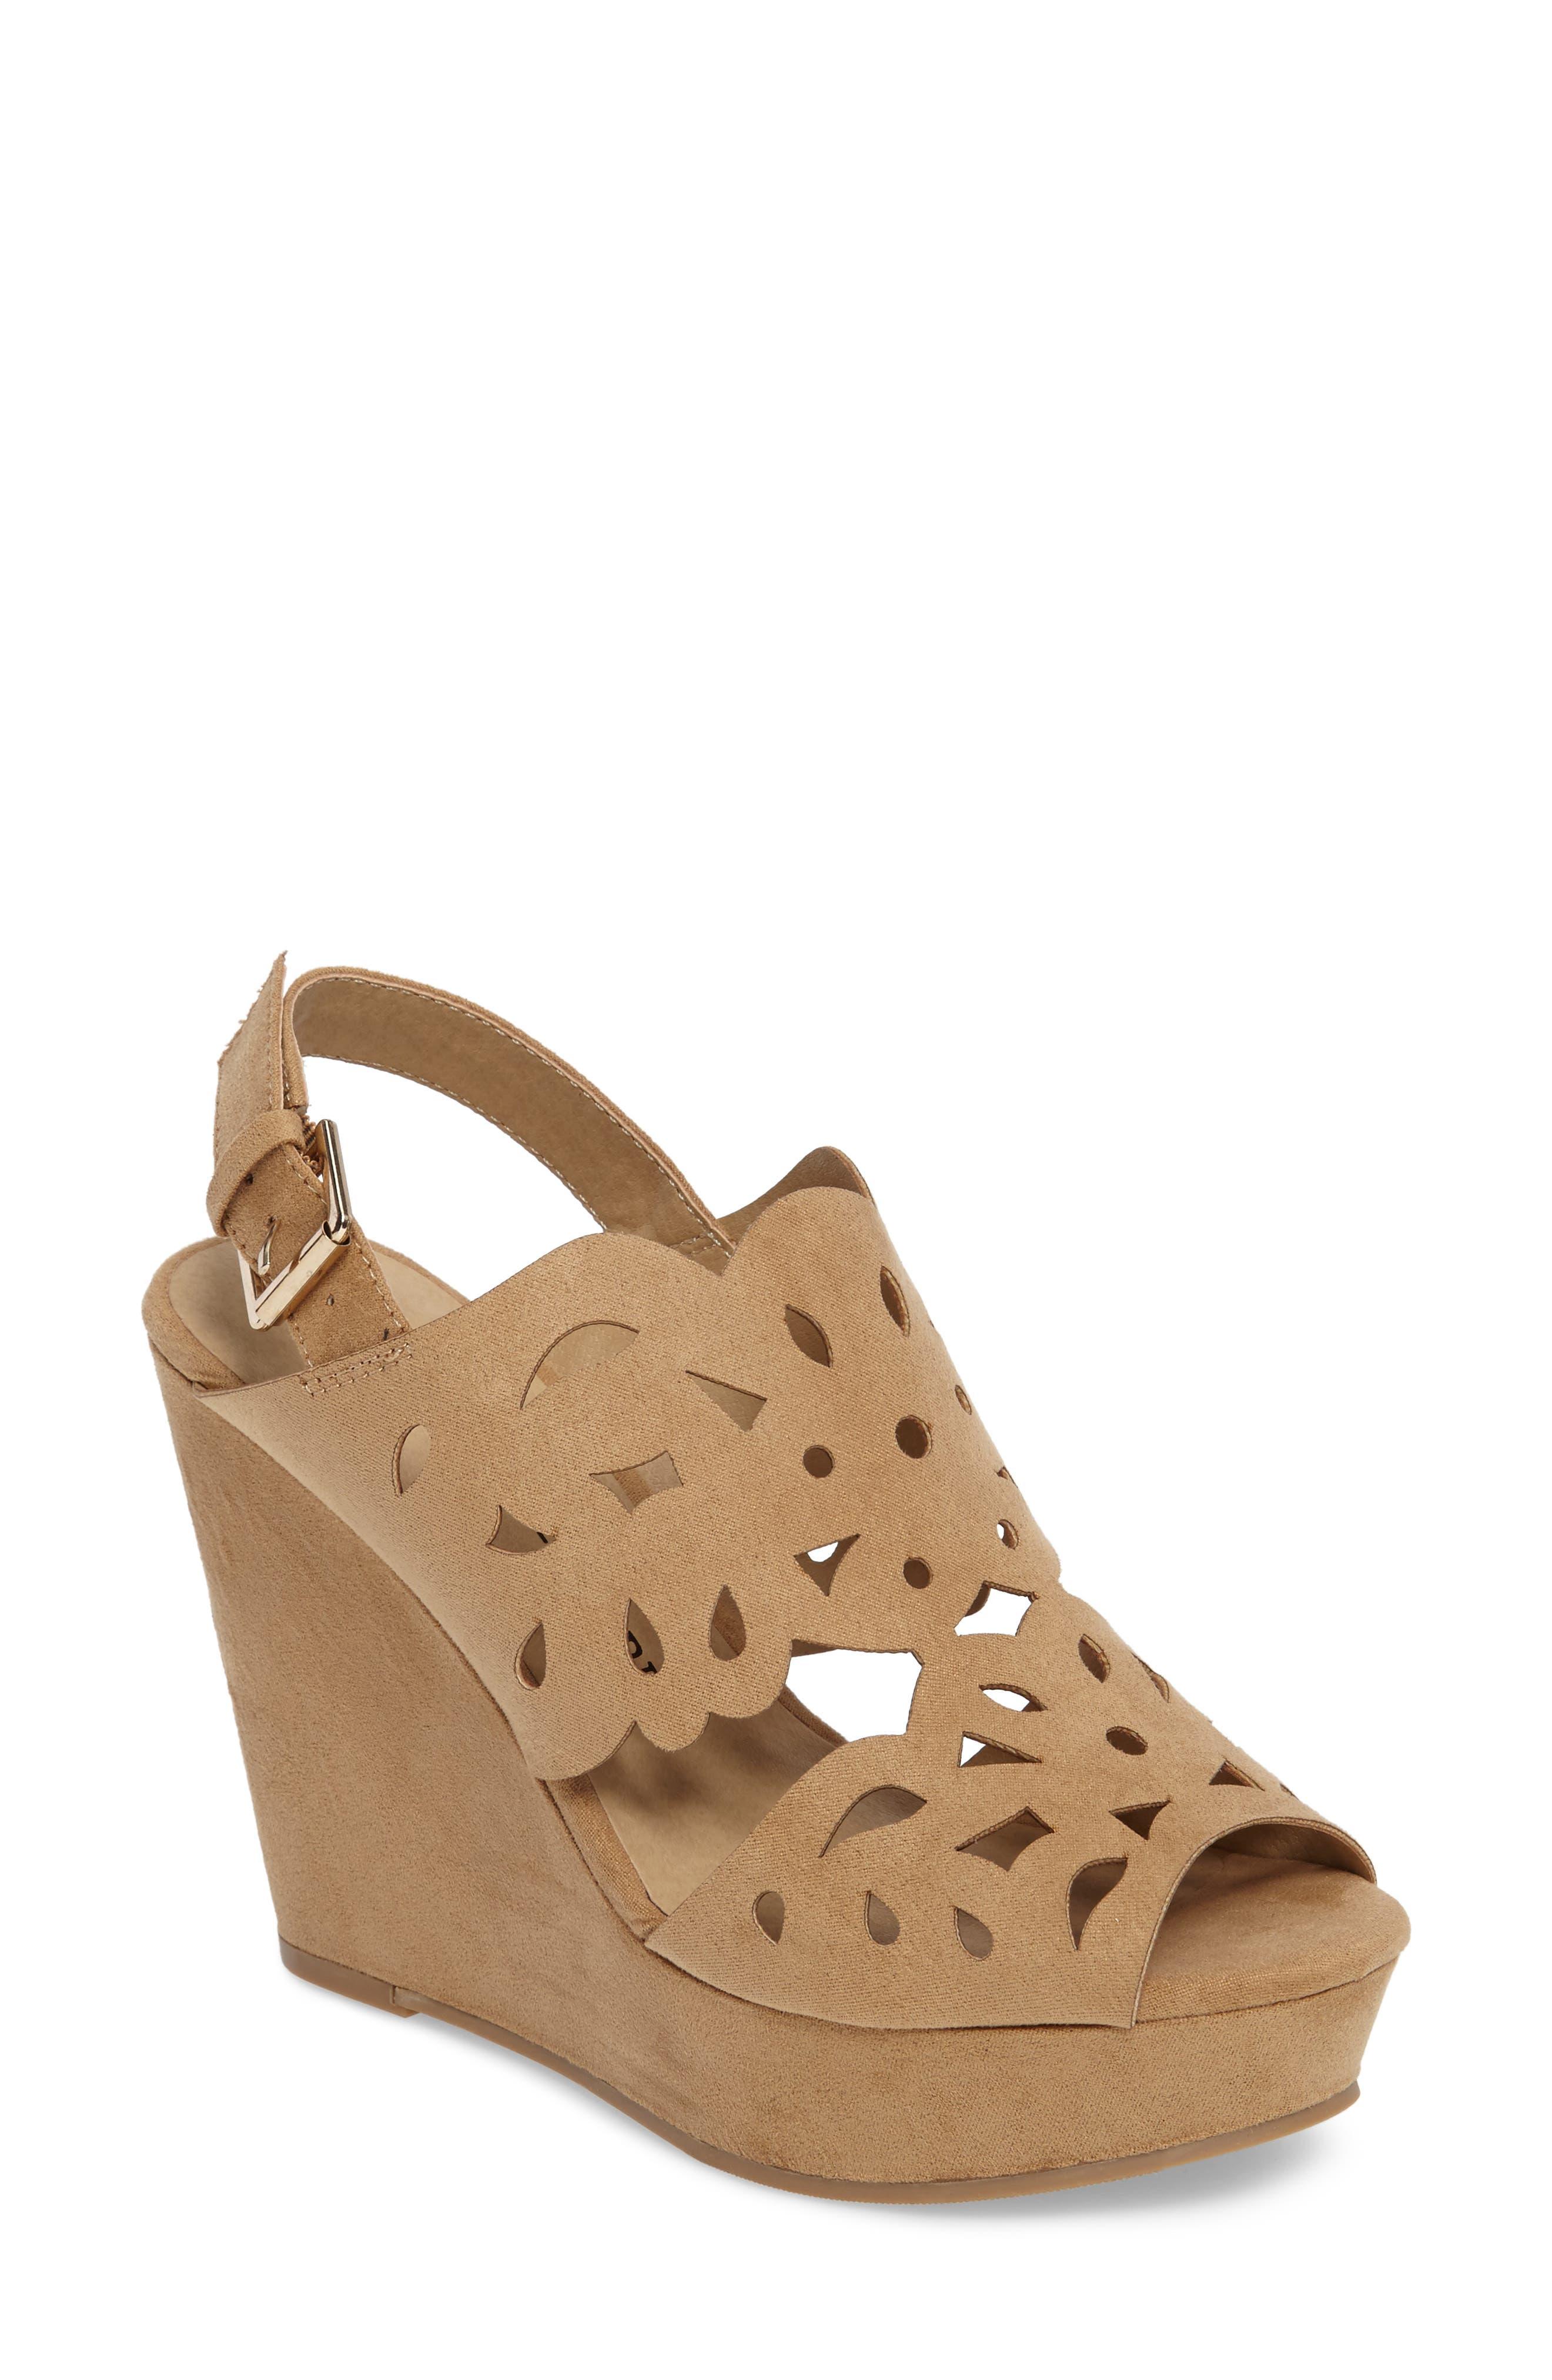 In Love Wedge Sandal,                         Main,                         color, Light Camel Suede